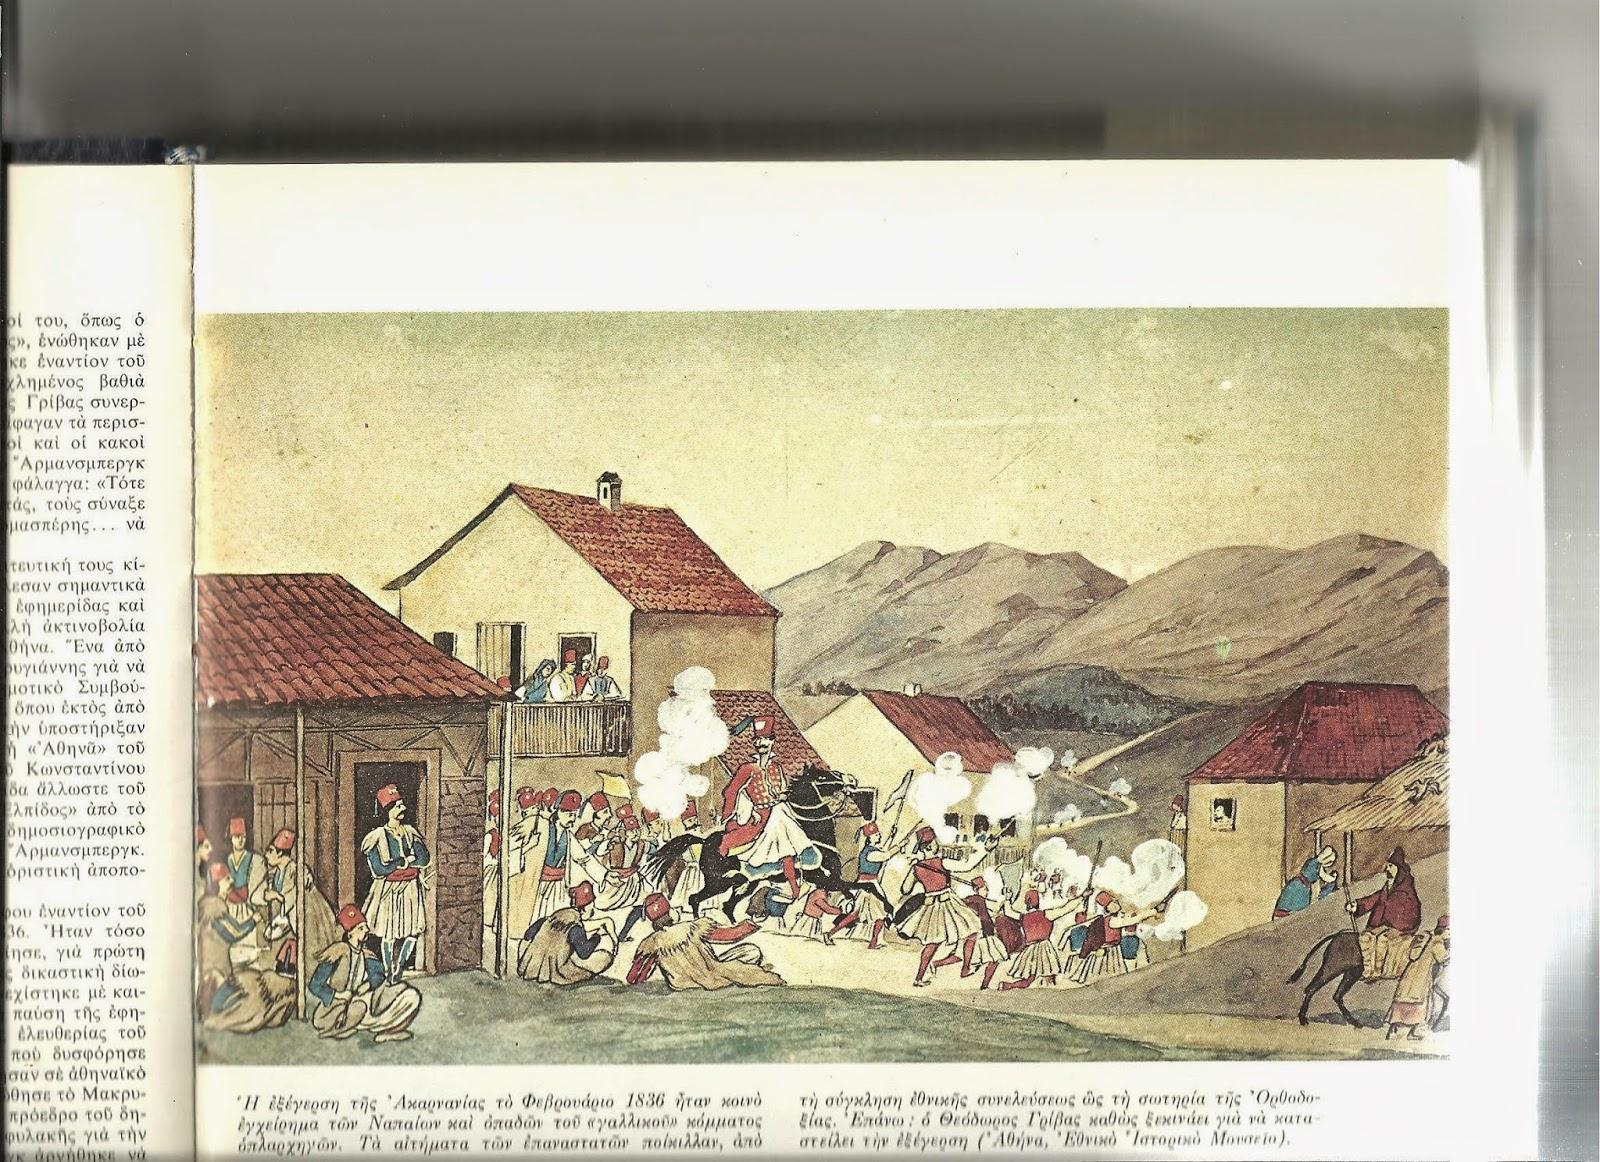 Oι αγροτικές εξεγέρσεις του Αστακού και Μύτικα το 1836